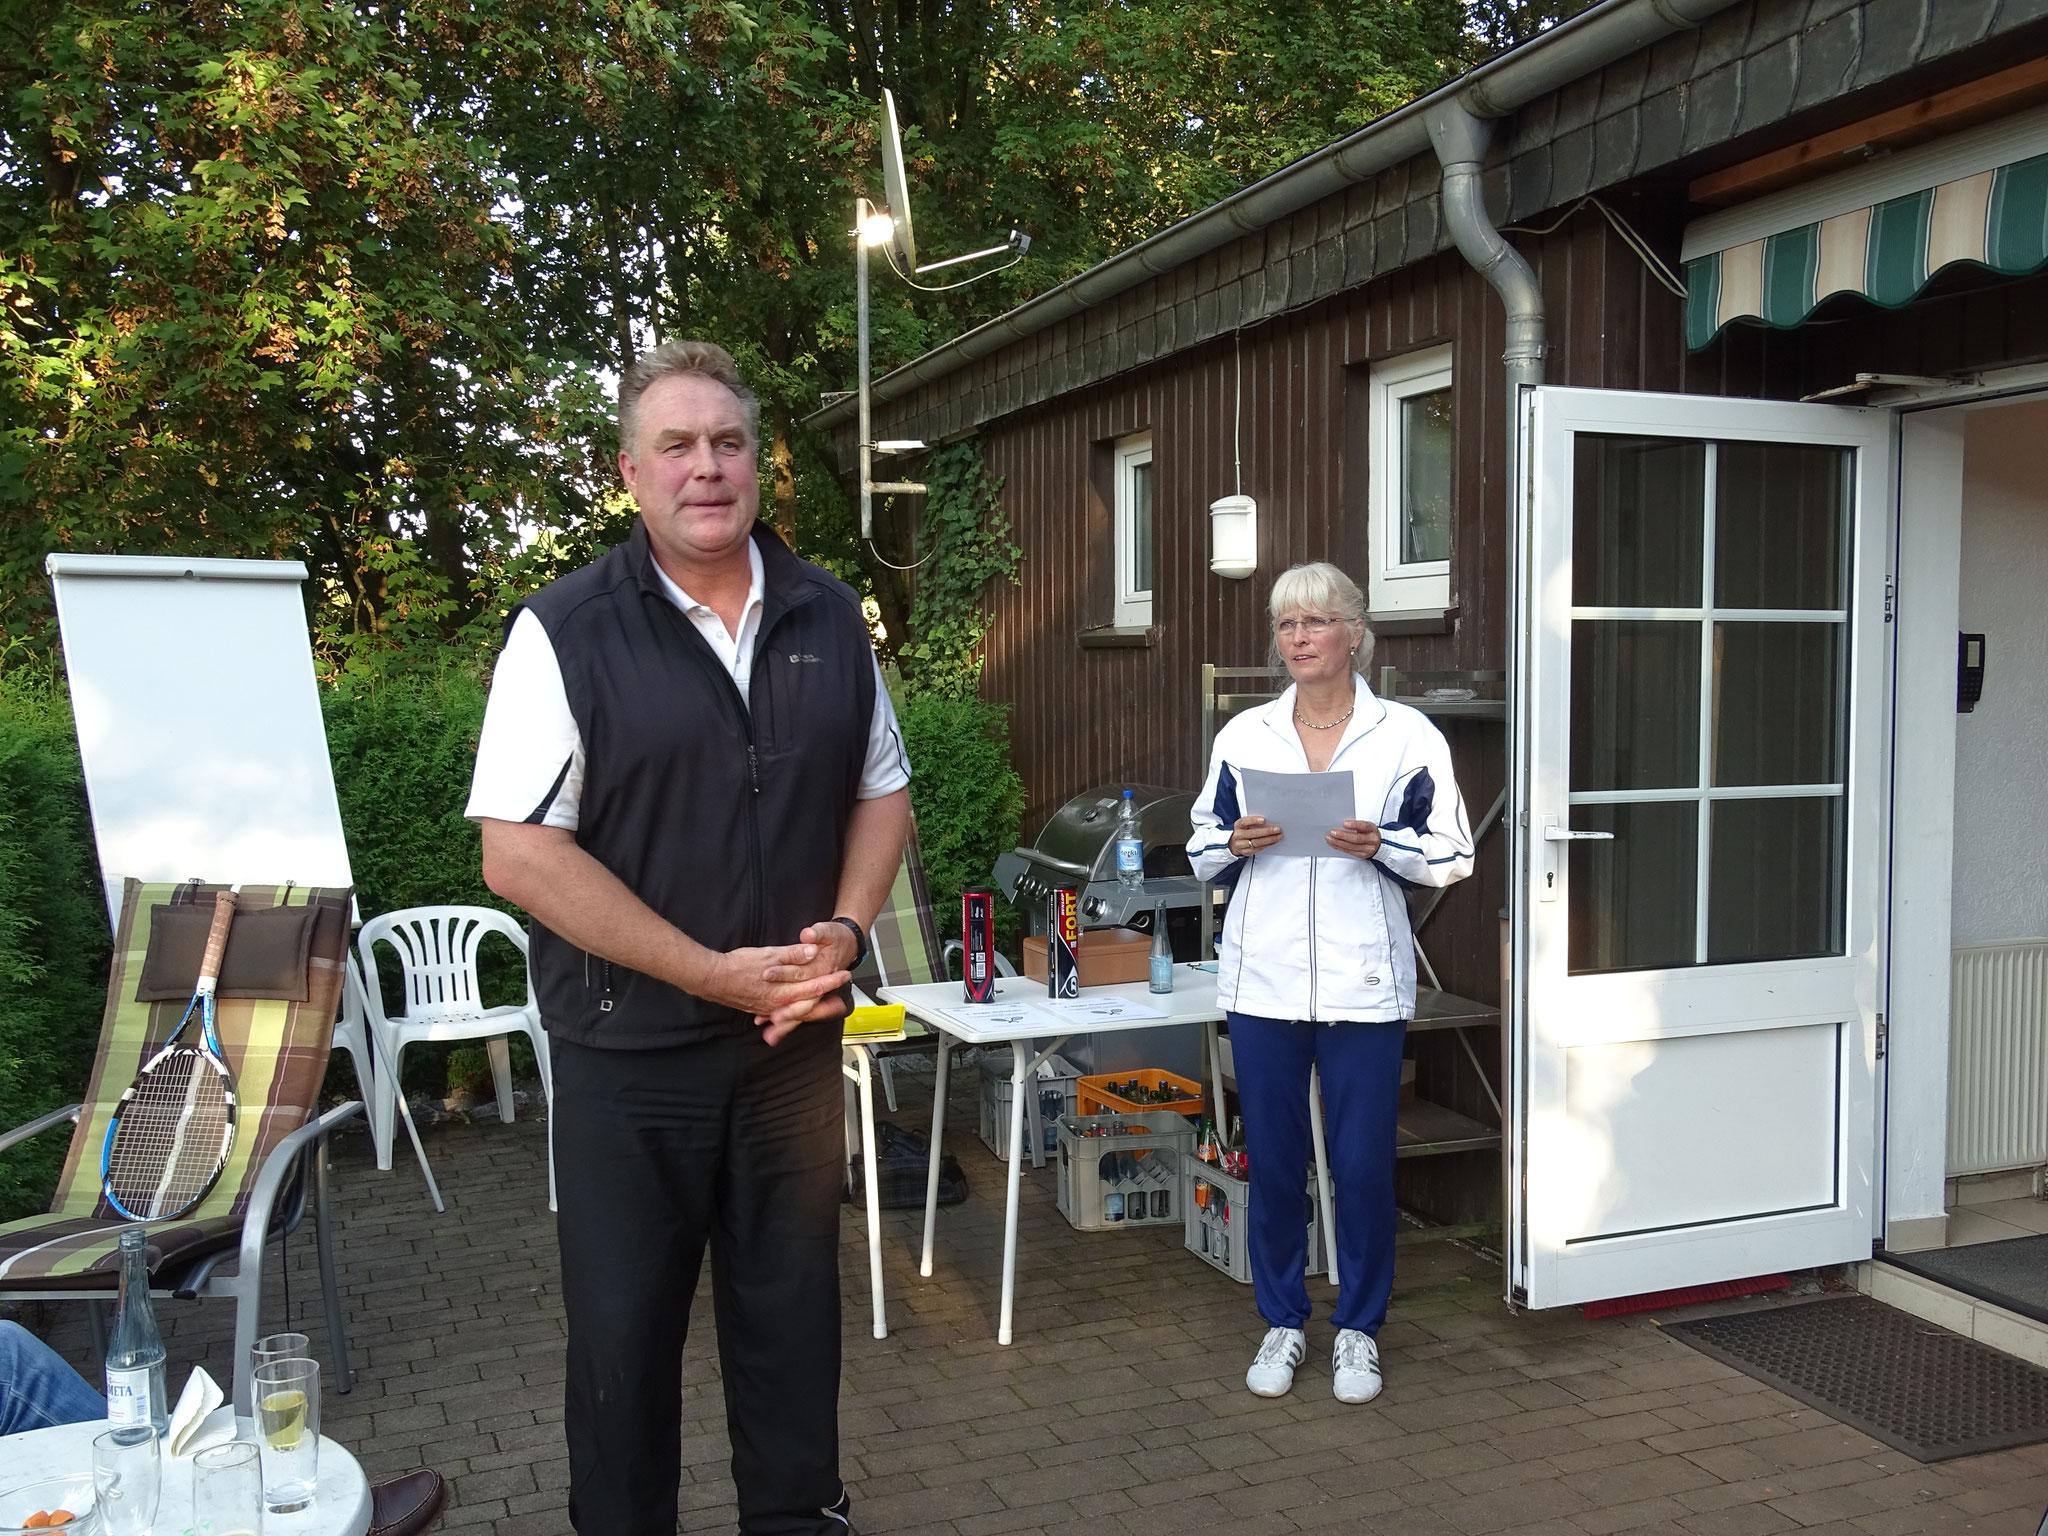 Wolfgang Haferkemper freute sich über die rege Beteiligung